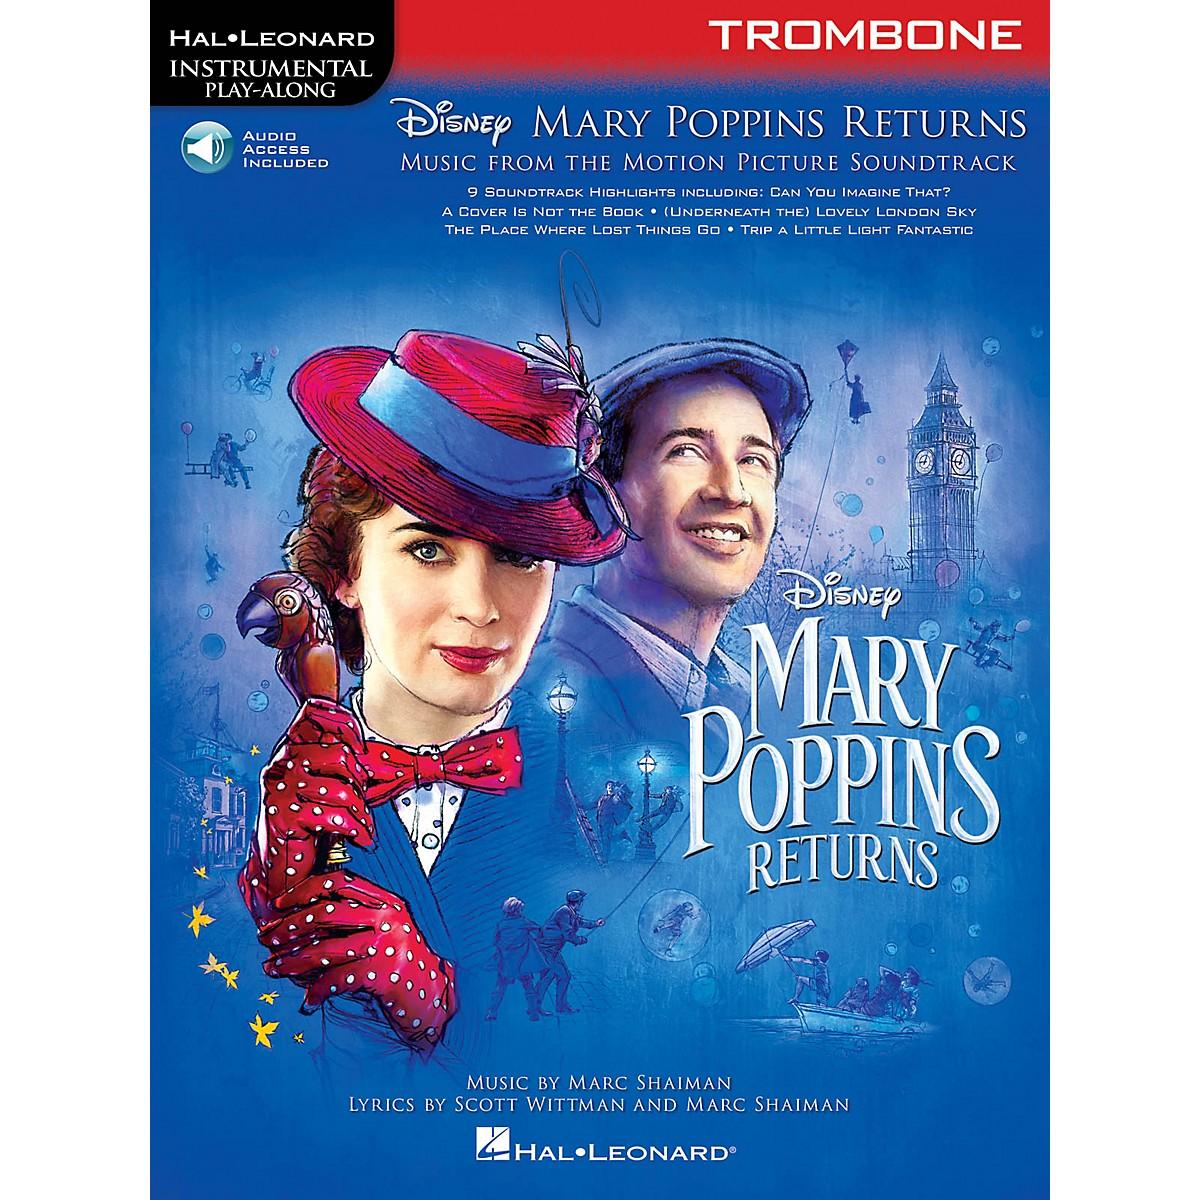 Hal Leonard Mary Poppins Returns for Trombone Instrumental Play-Along Book/Audio Online